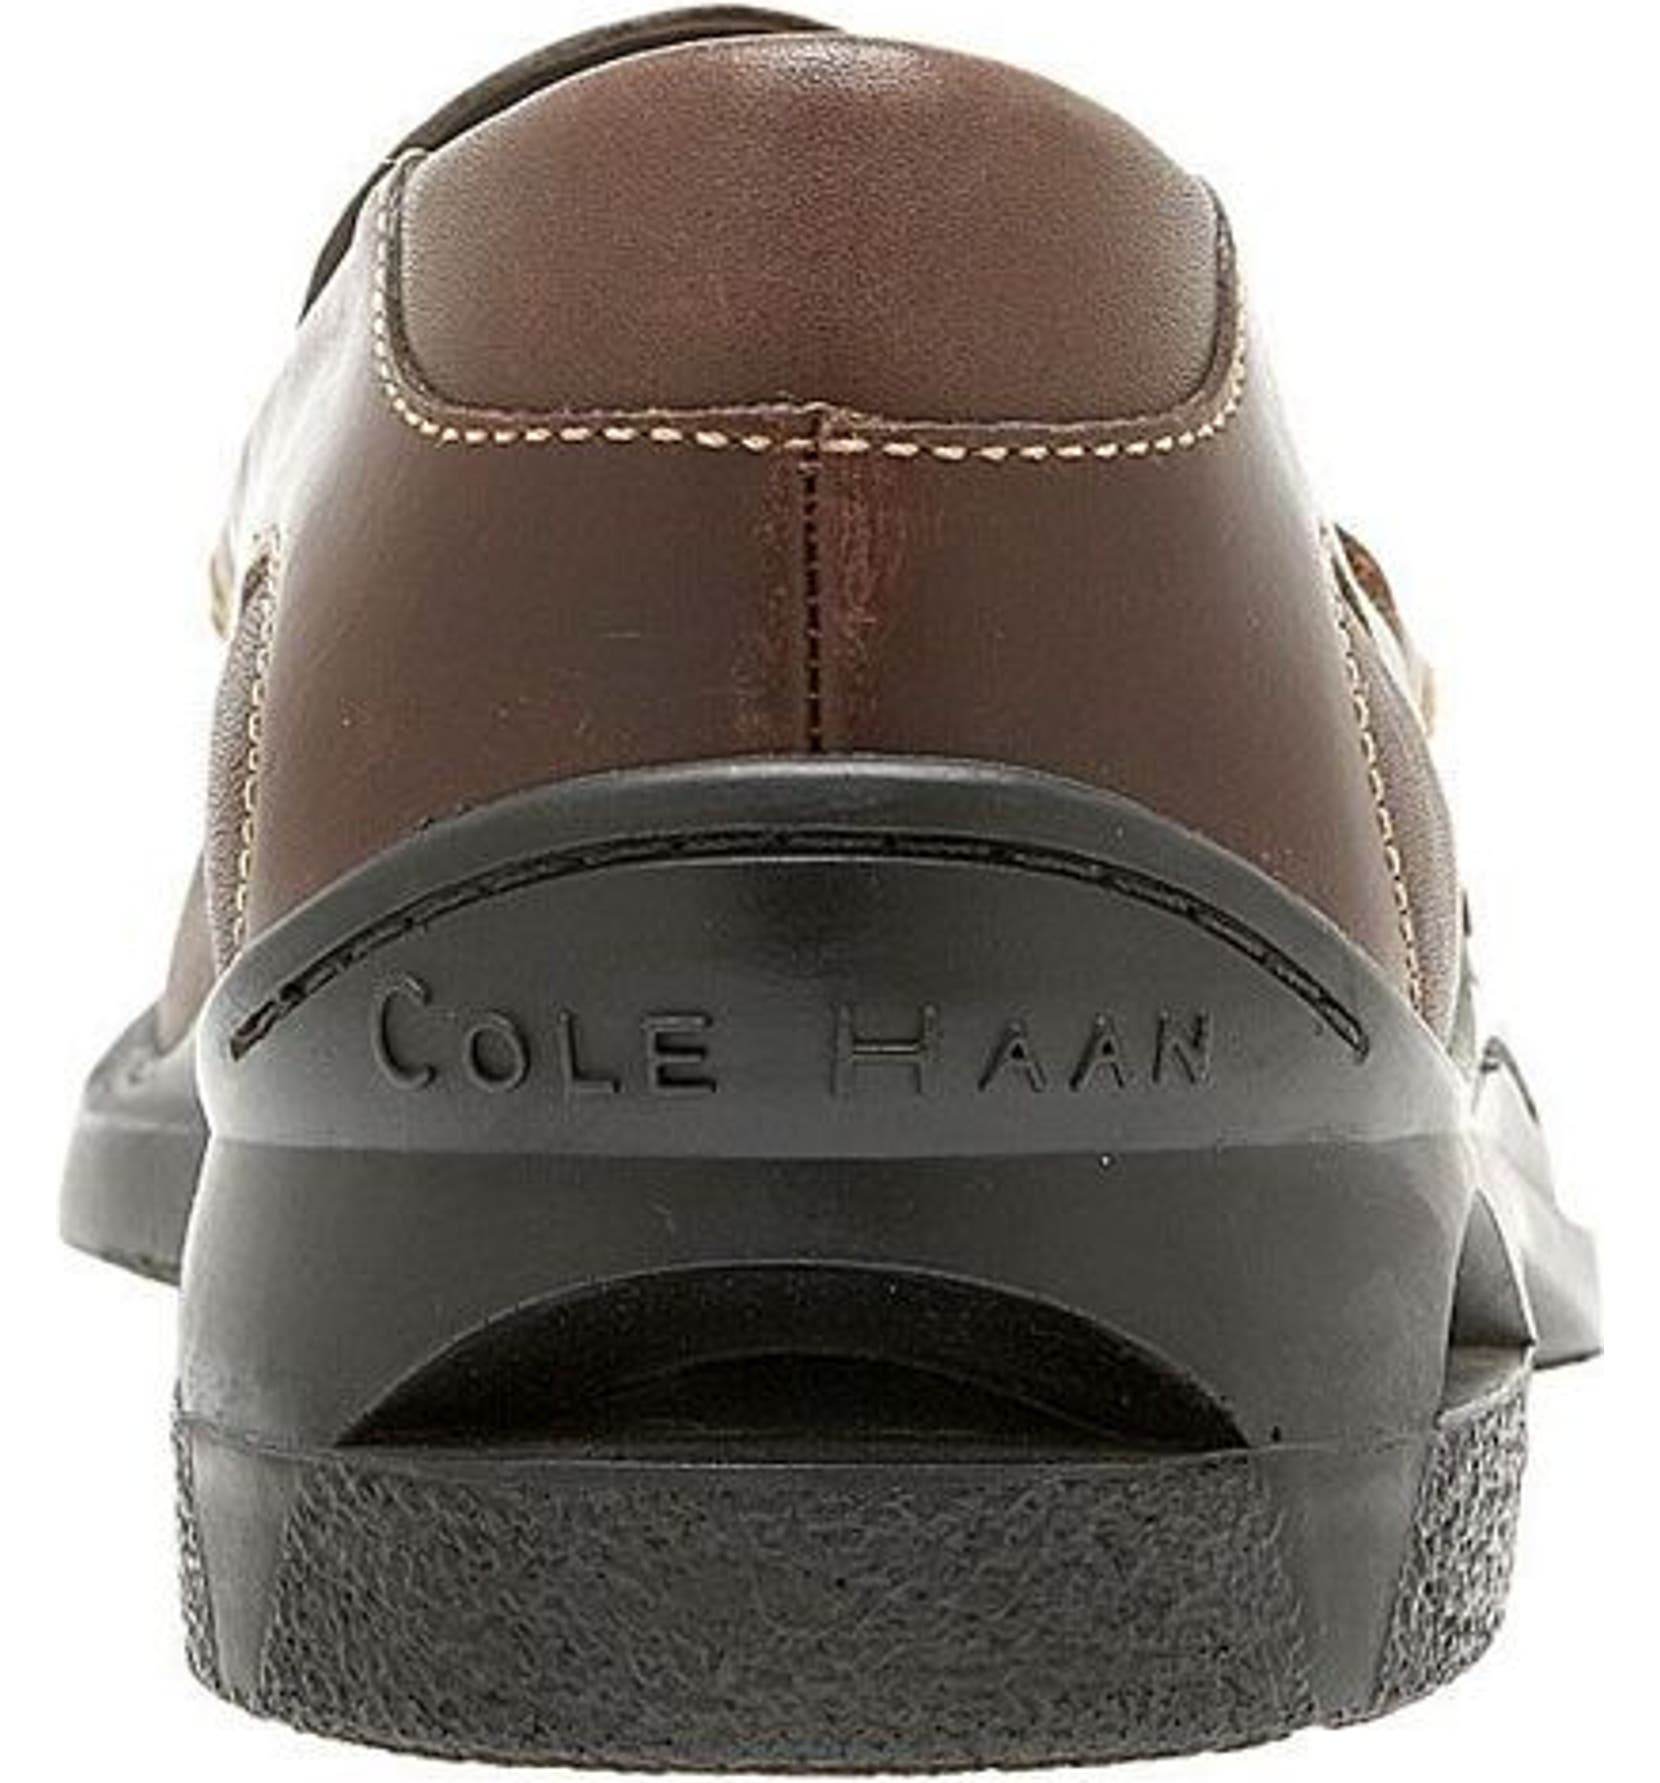 5962323ba1d Cole Haan  Air Santa Barbara  Penny Loafer